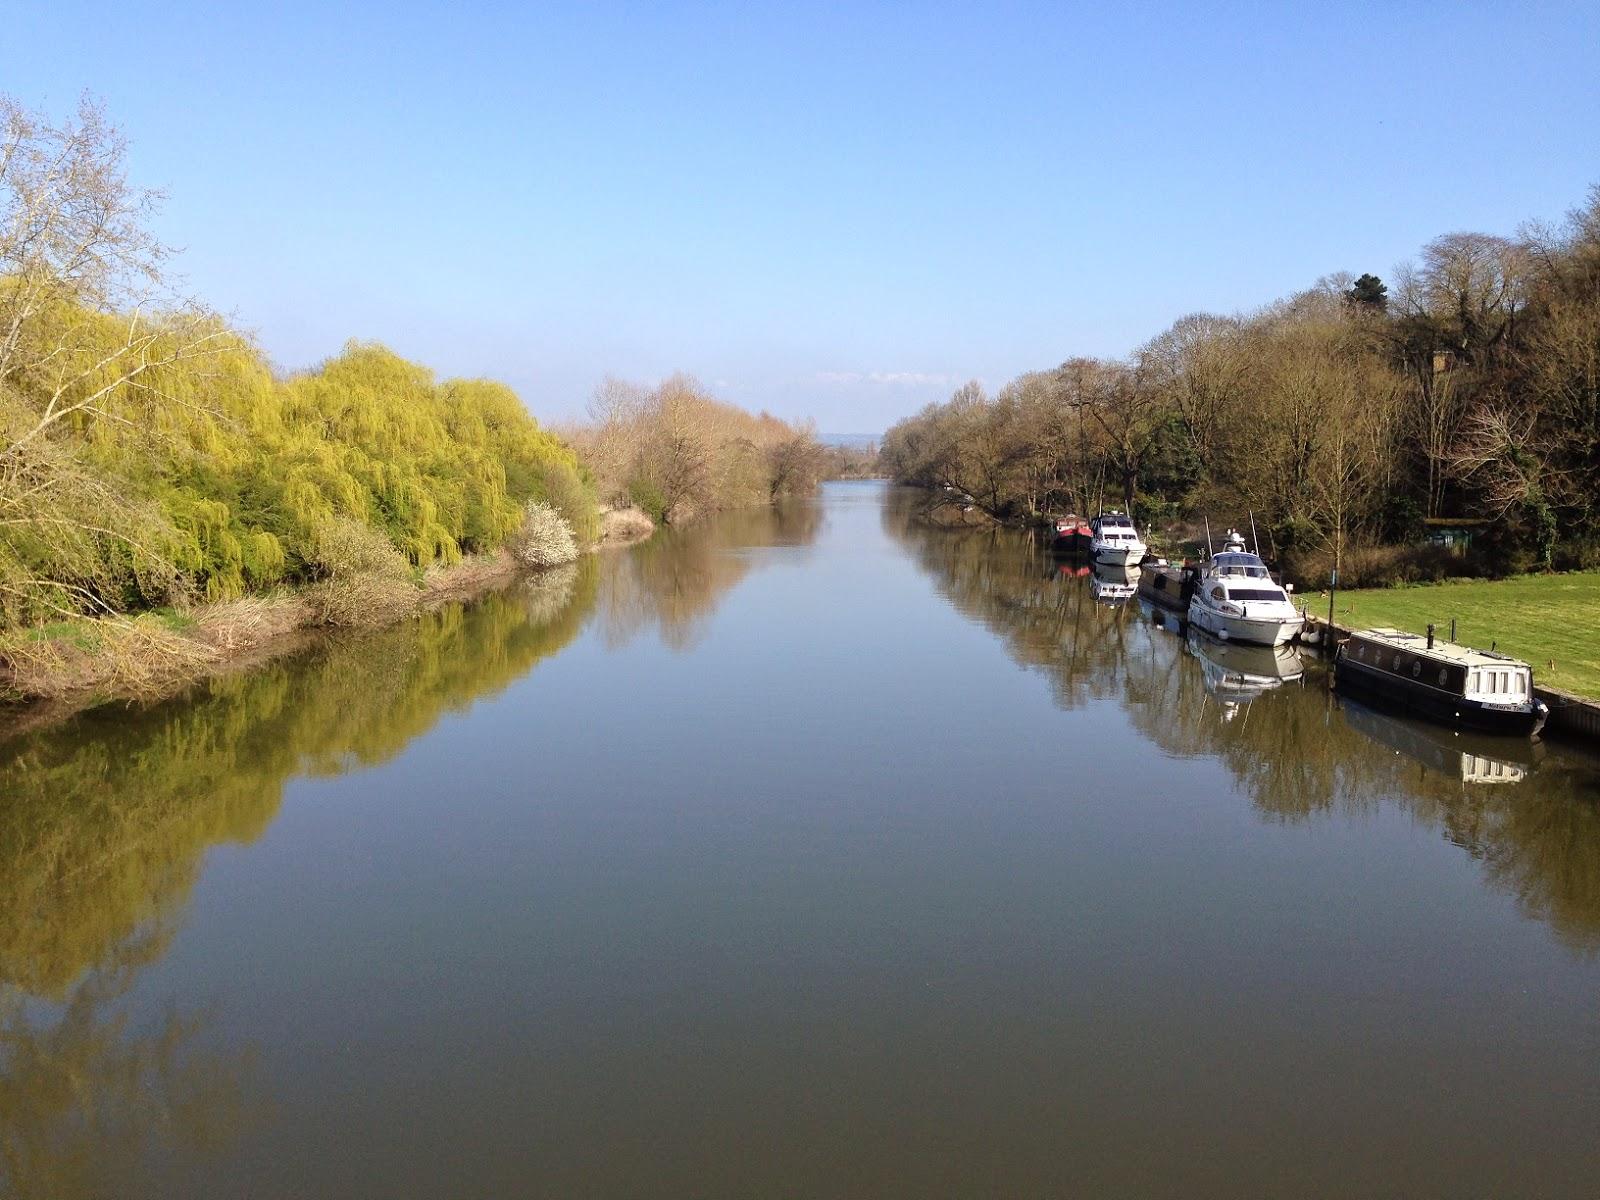 River Thames, near Shillingford, Oxfordshire